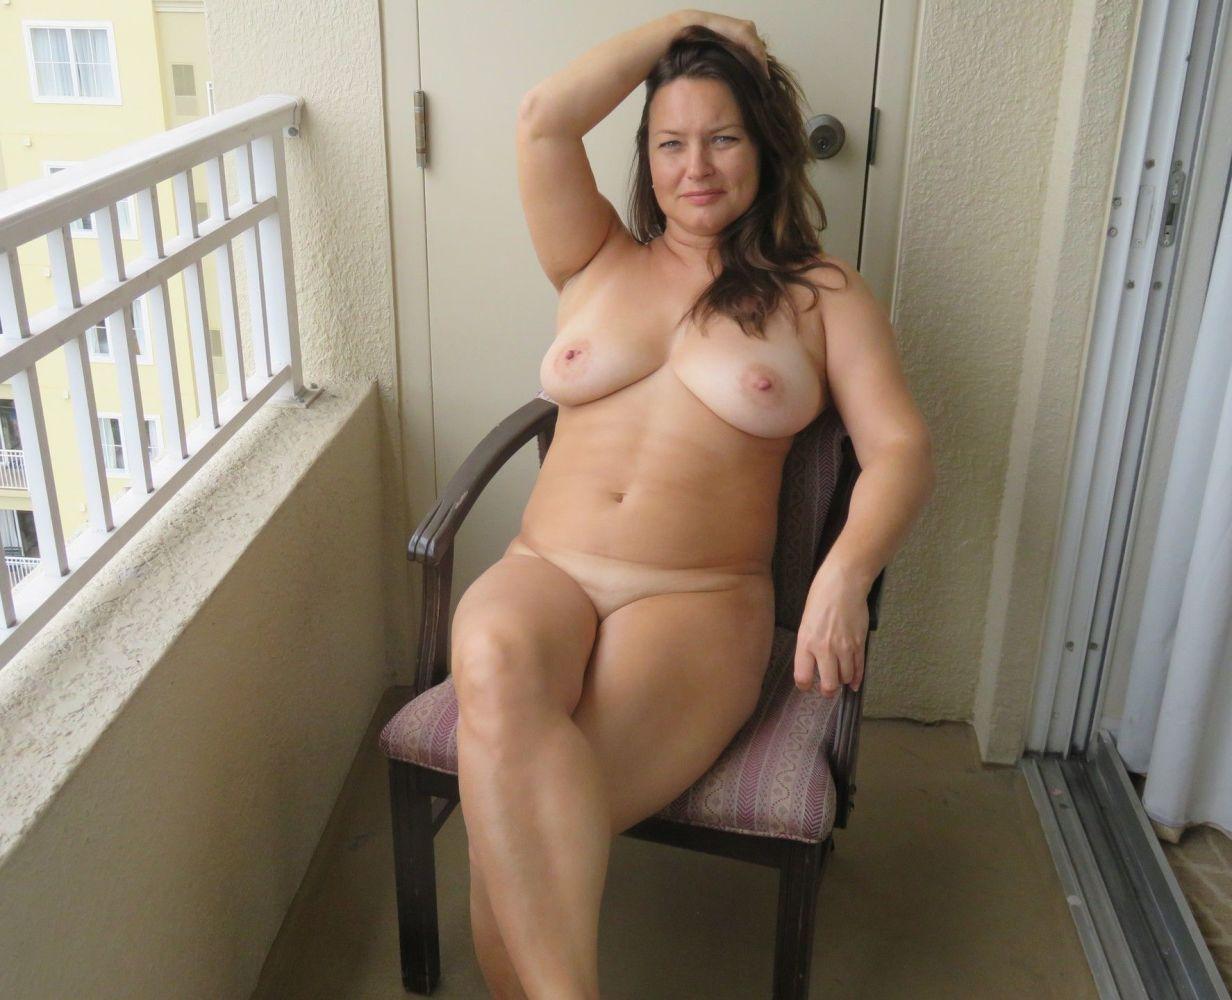 Curvy naked mom hardcore sex